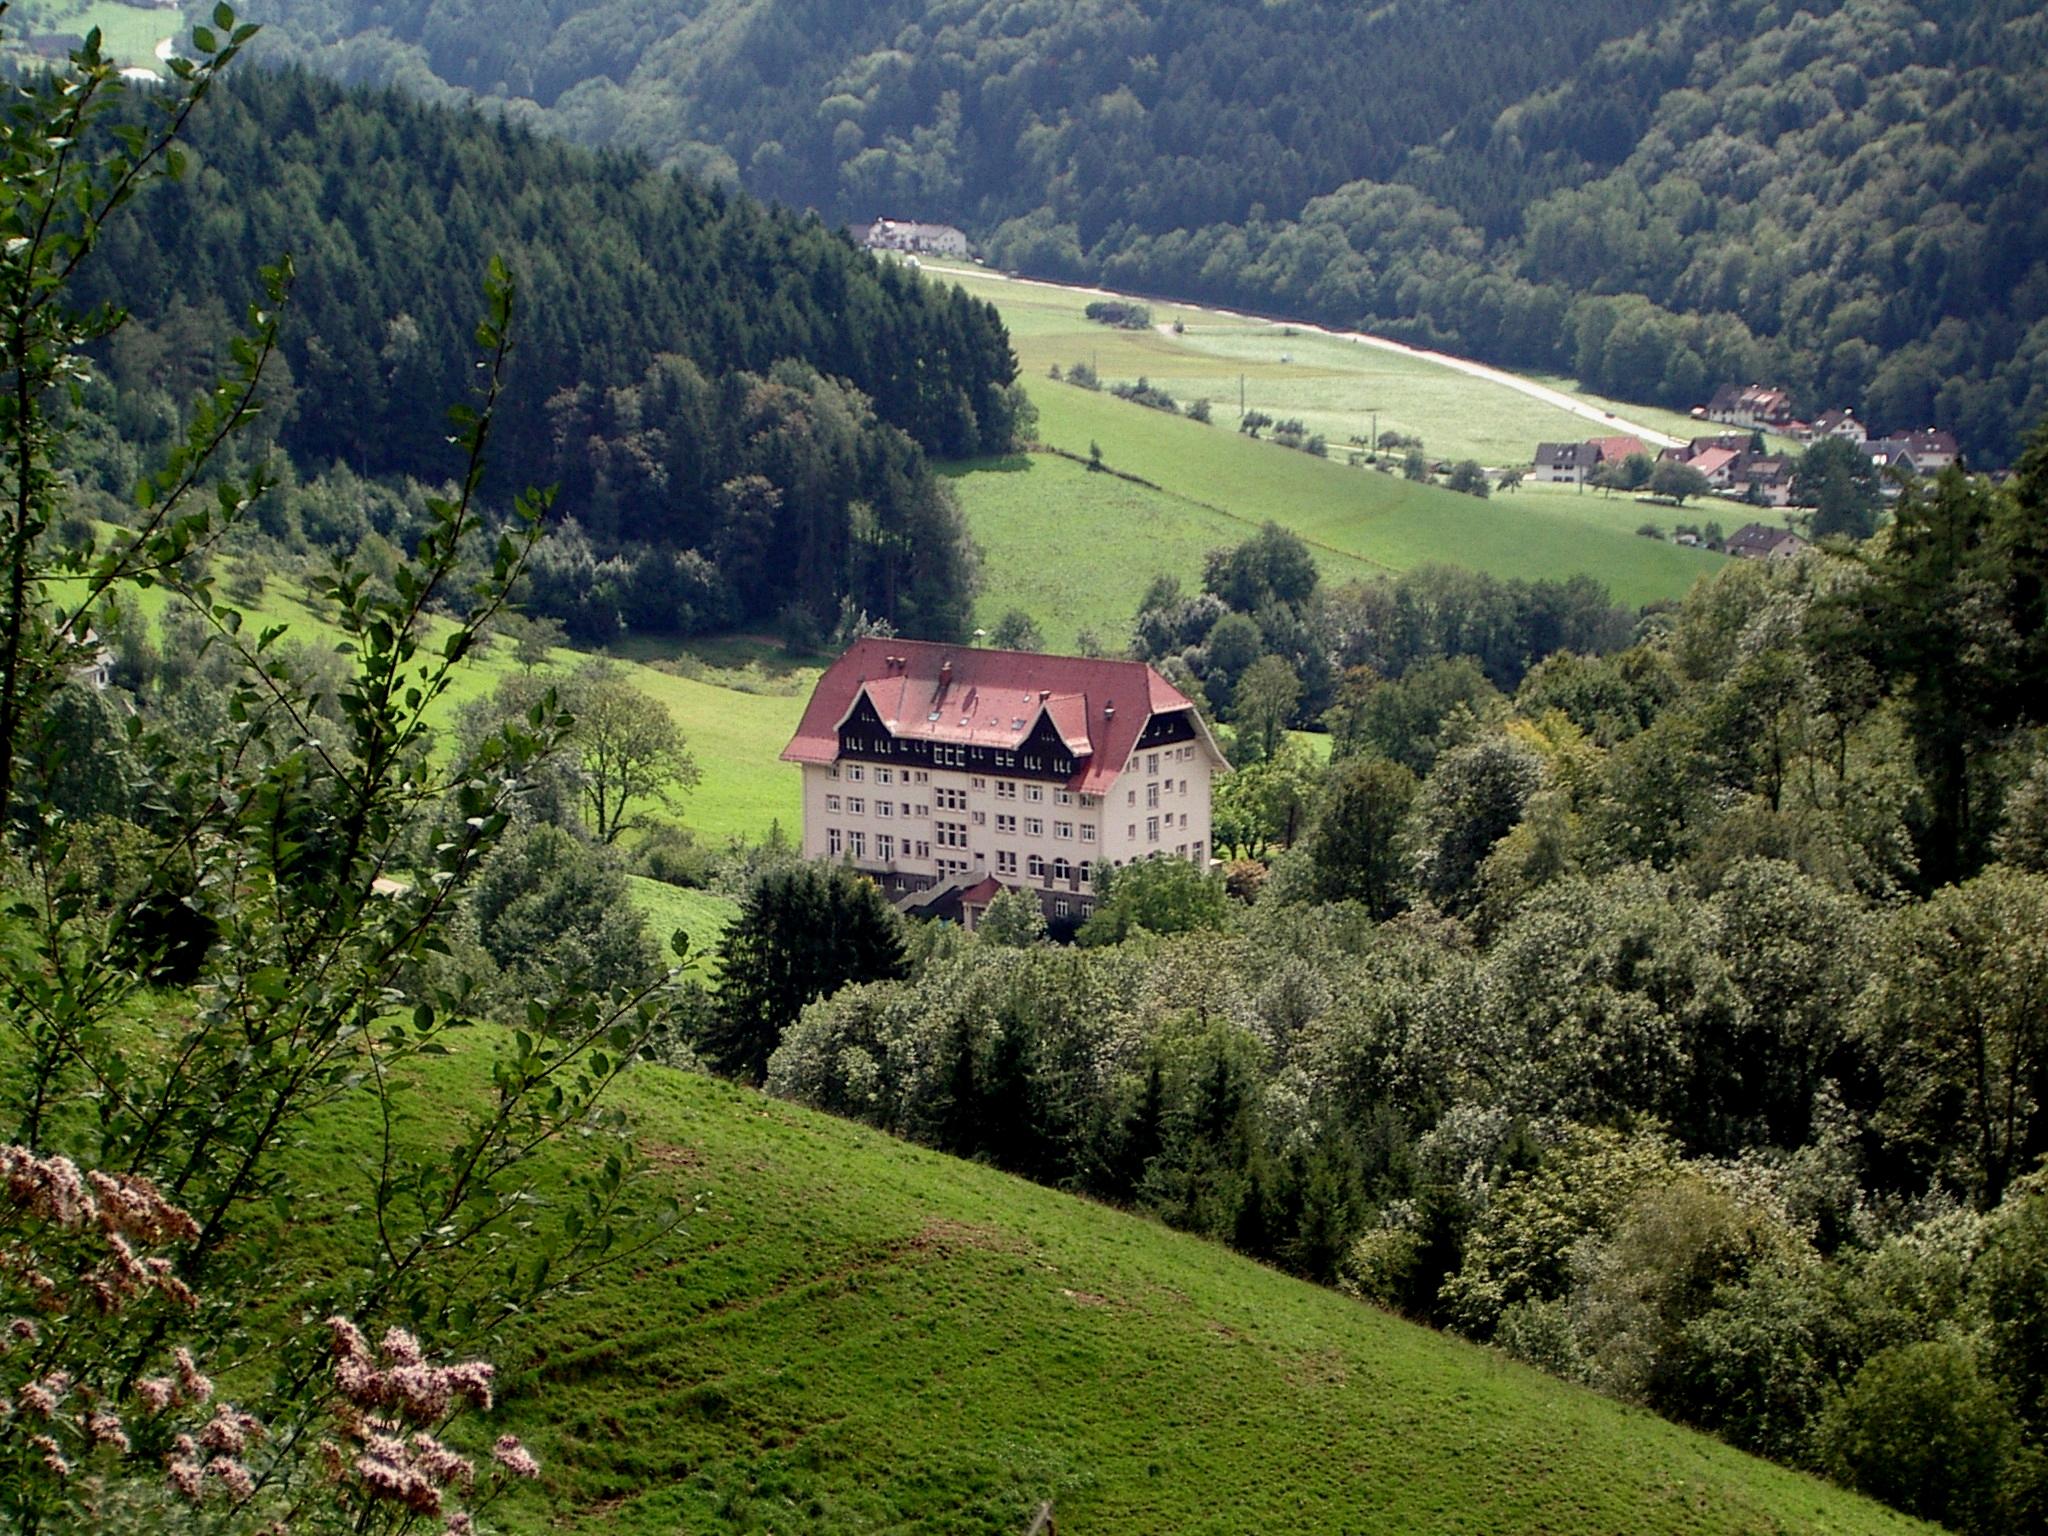 Serie Schwarzwaldklinik